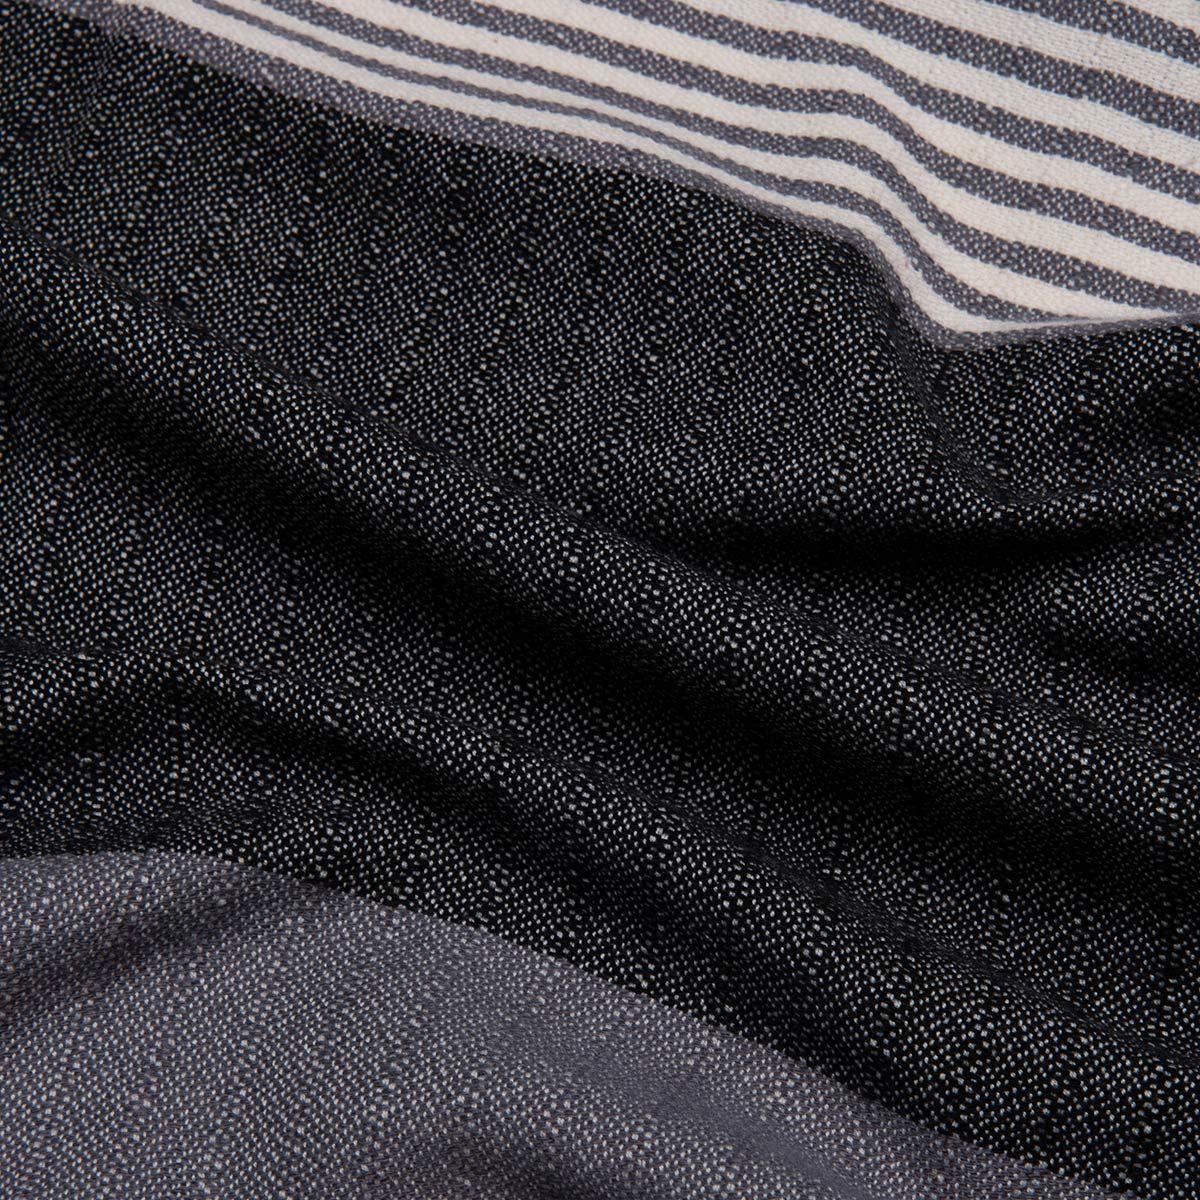 Peshtowel Twin Sultan - Dark Grey / Black